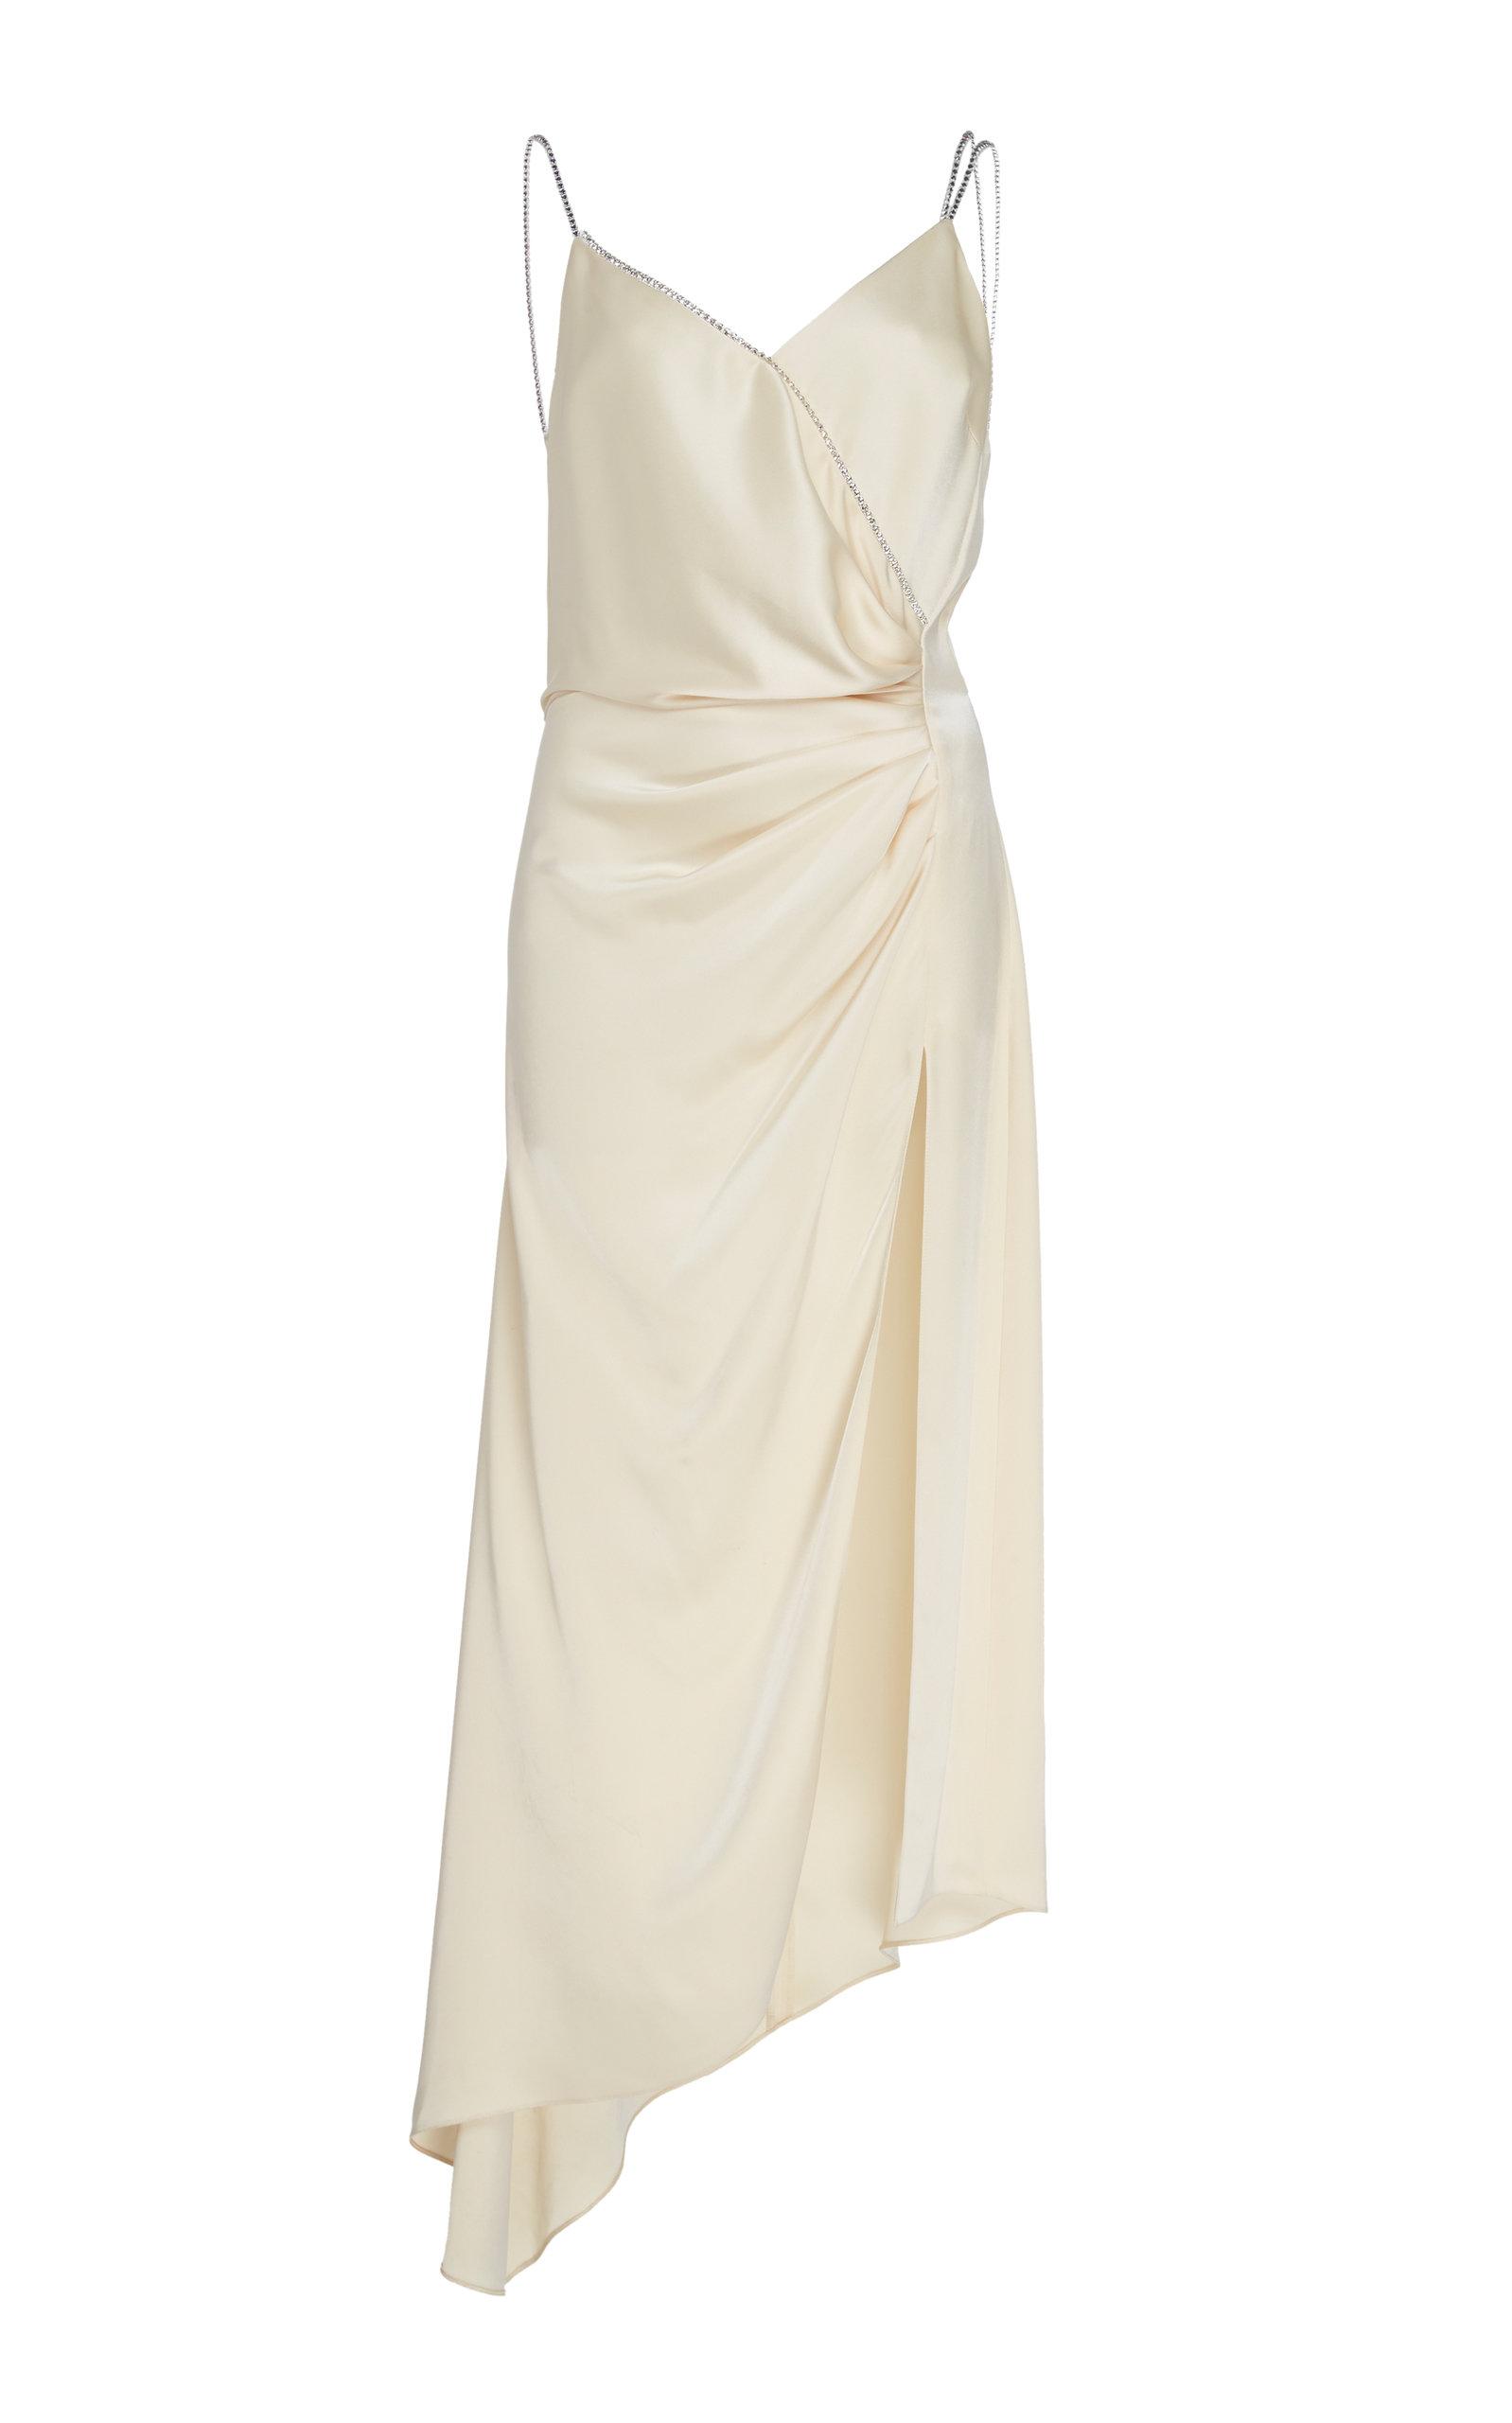 Buy David Koma Asymmetrical Silk-Satin Slip Dress online, shop David Koma at the best price